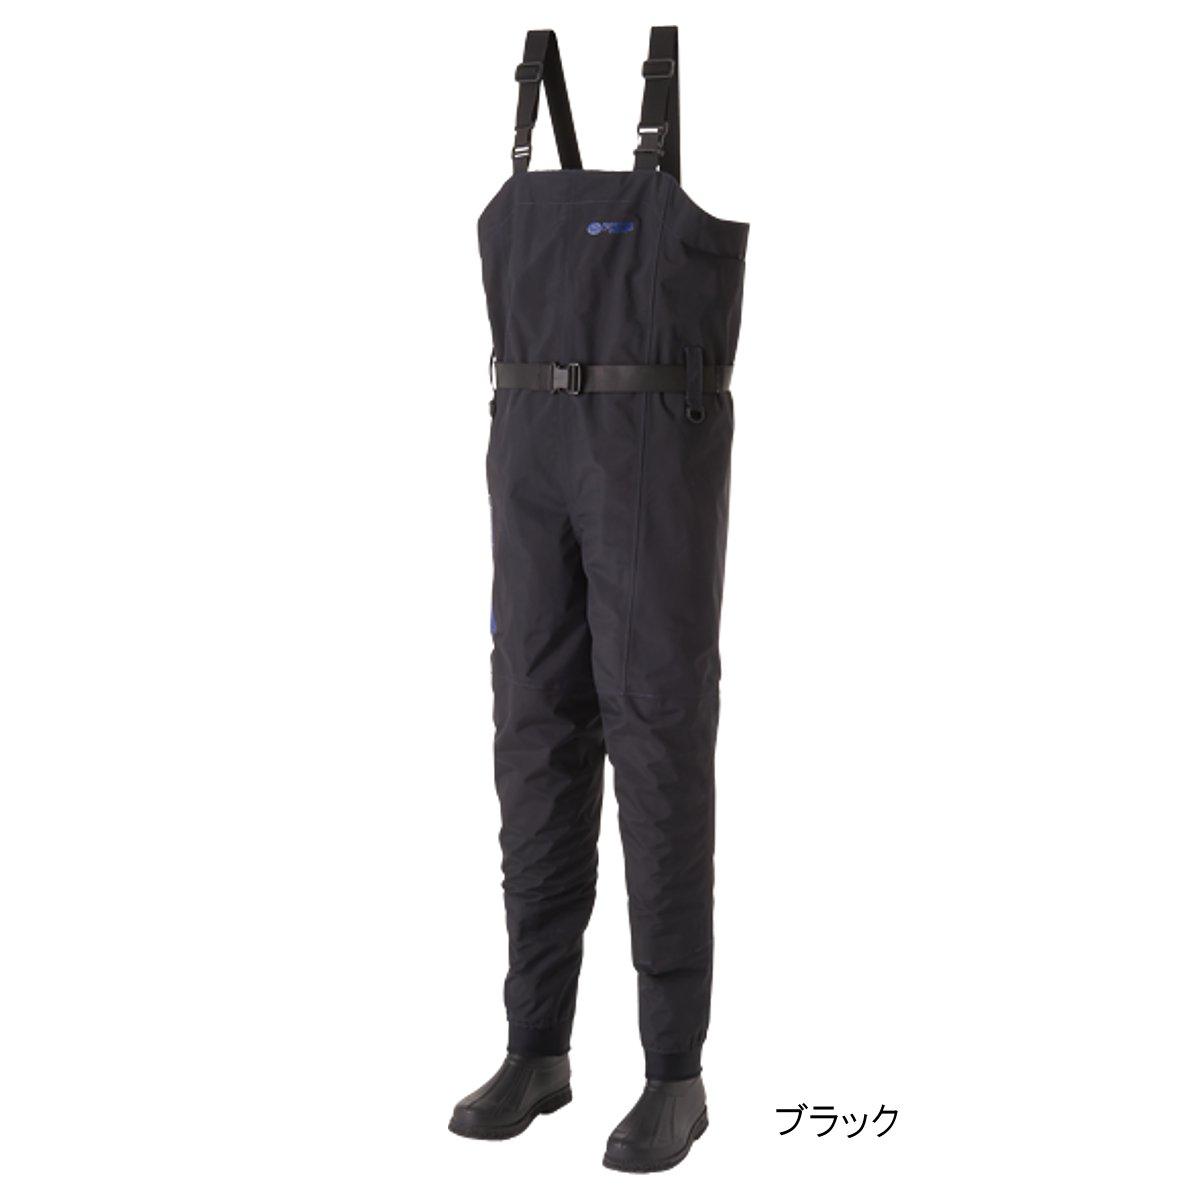 RBB タイドウォーカーIII No.8784 M ブラック(東日本店)